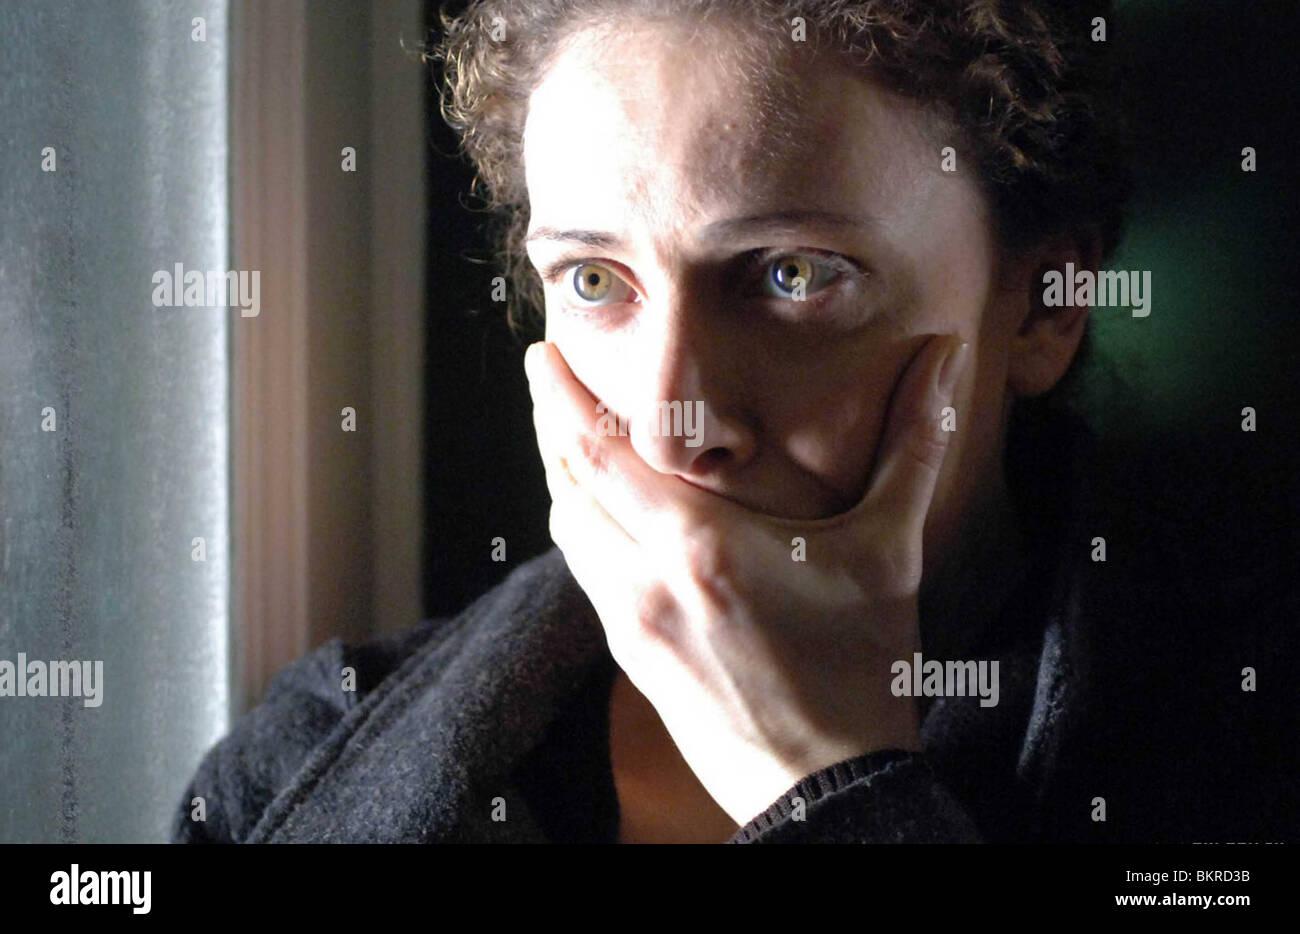 LA SCONOSCIUTA (2006) DIE UNBEKANNTE FRAU (ALT) GIUSEPPE TORNATORE (DIR) 001 Stockbild